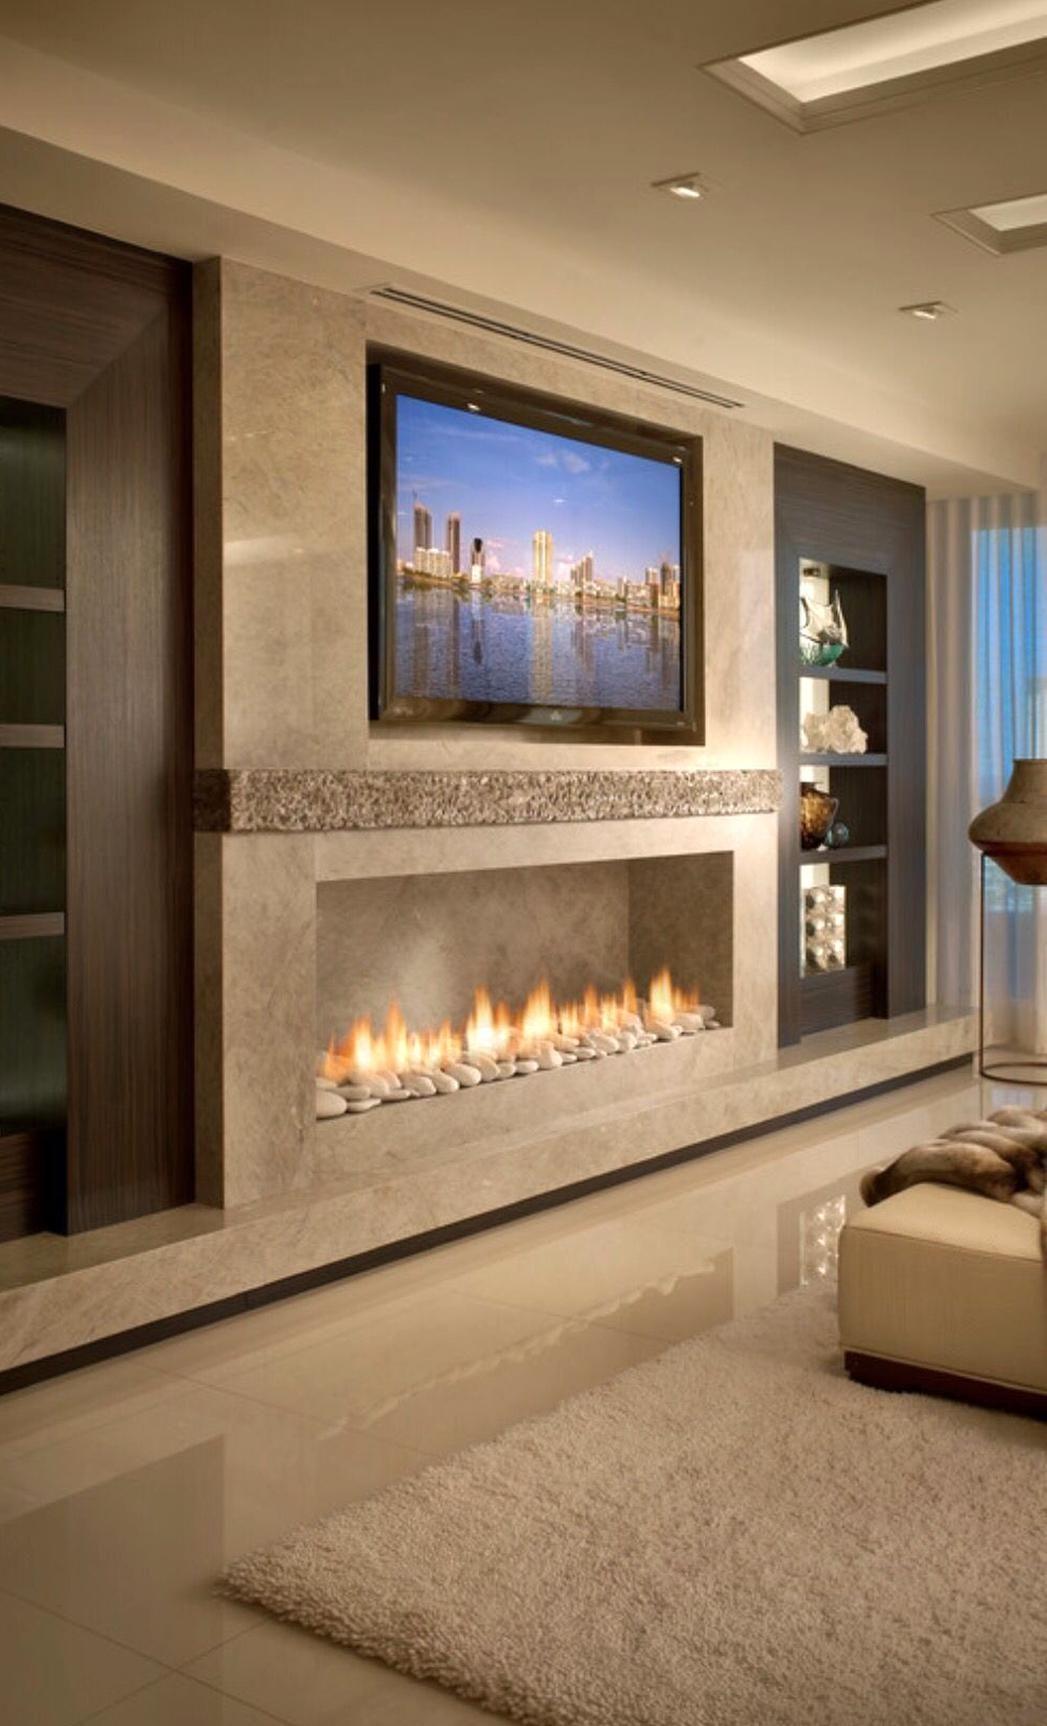 Great Fireplace Modern Design Luxury Living Room Fireplace Modern Design Trendy Living Rooms